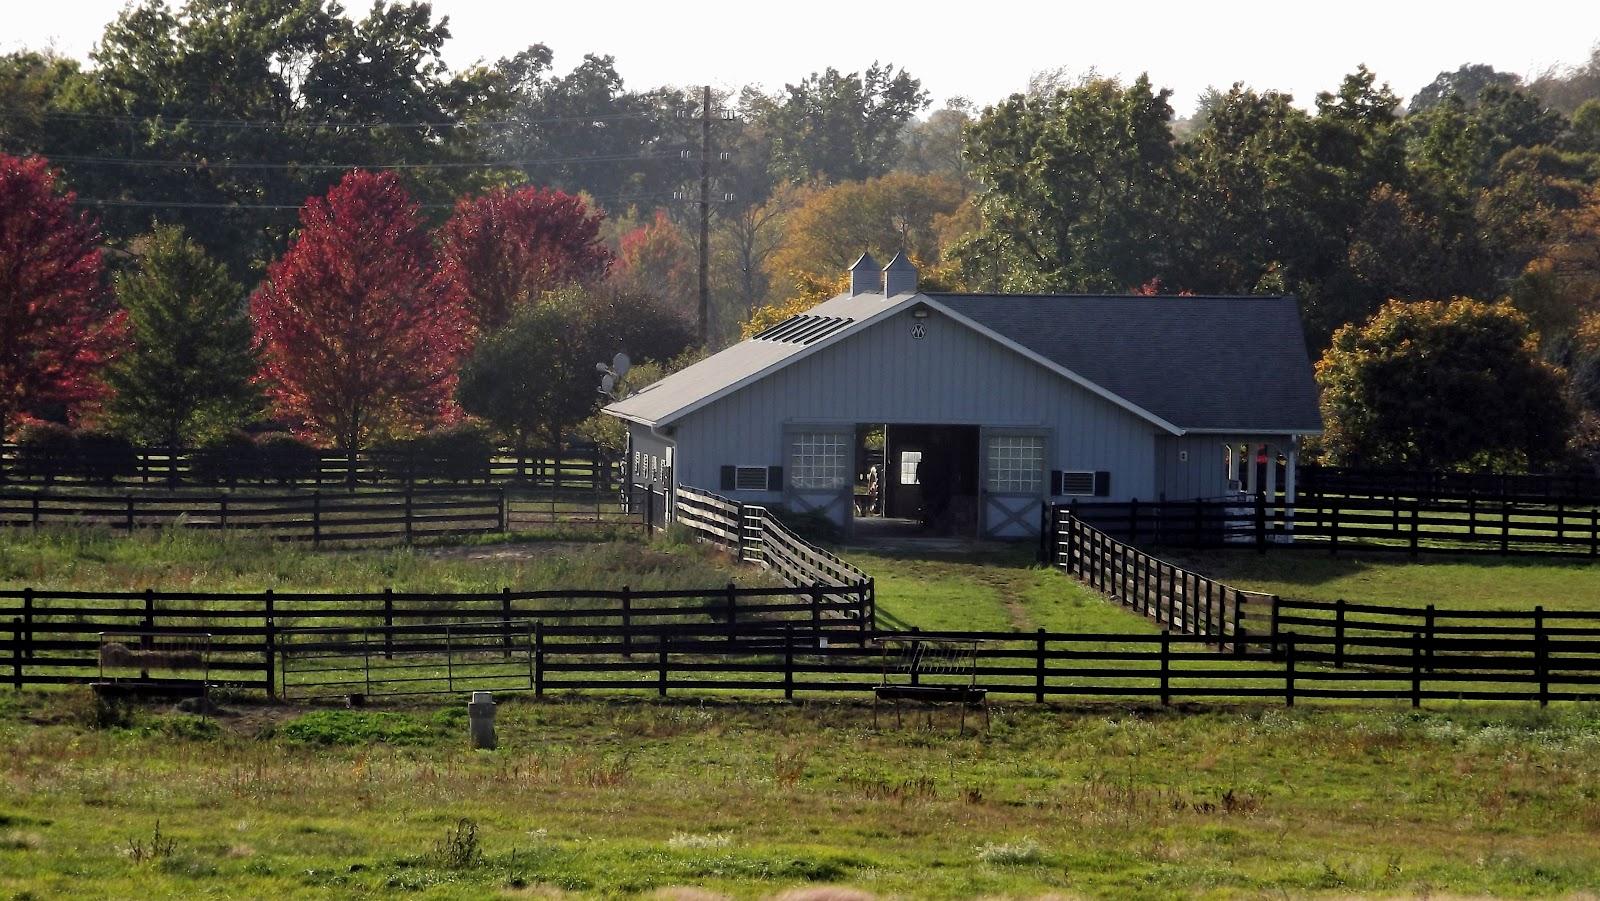 Southern michigan horse farm fall colors for Horse farm